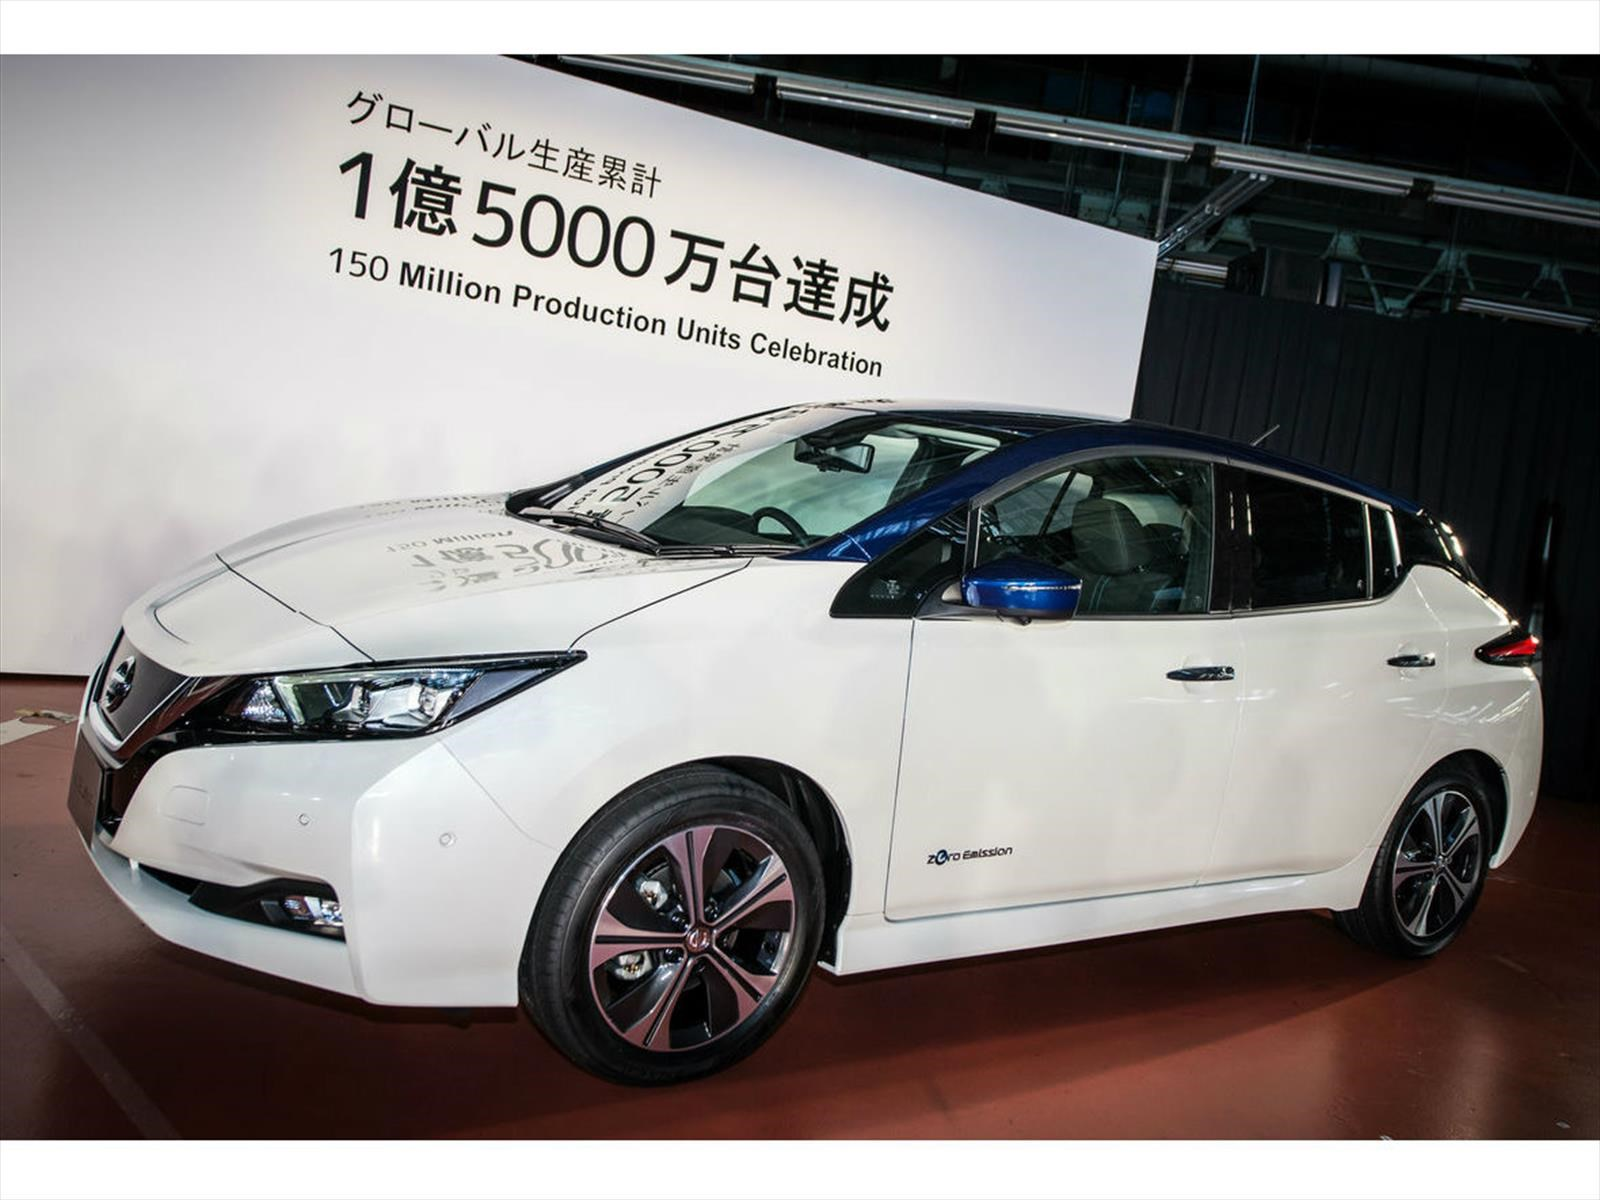 Nissan pproduce 150 millones de vehículos a nivel global